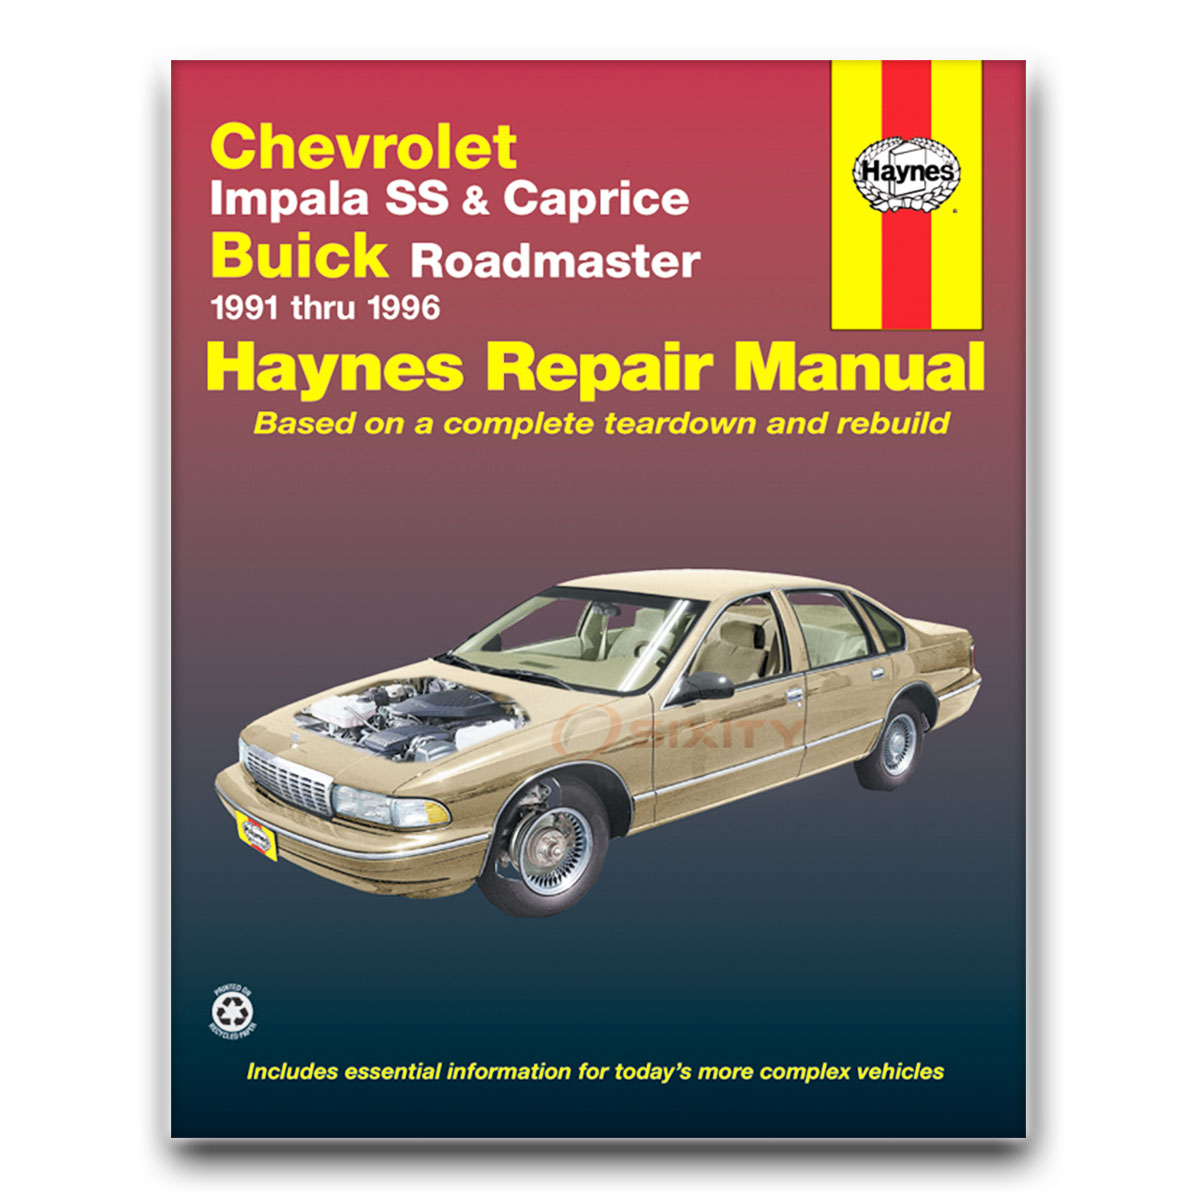 haynes chevrolet impala ss buick roadmaster 91 96 repair manual rh ebay com 95 Impala 1996 impala service manual